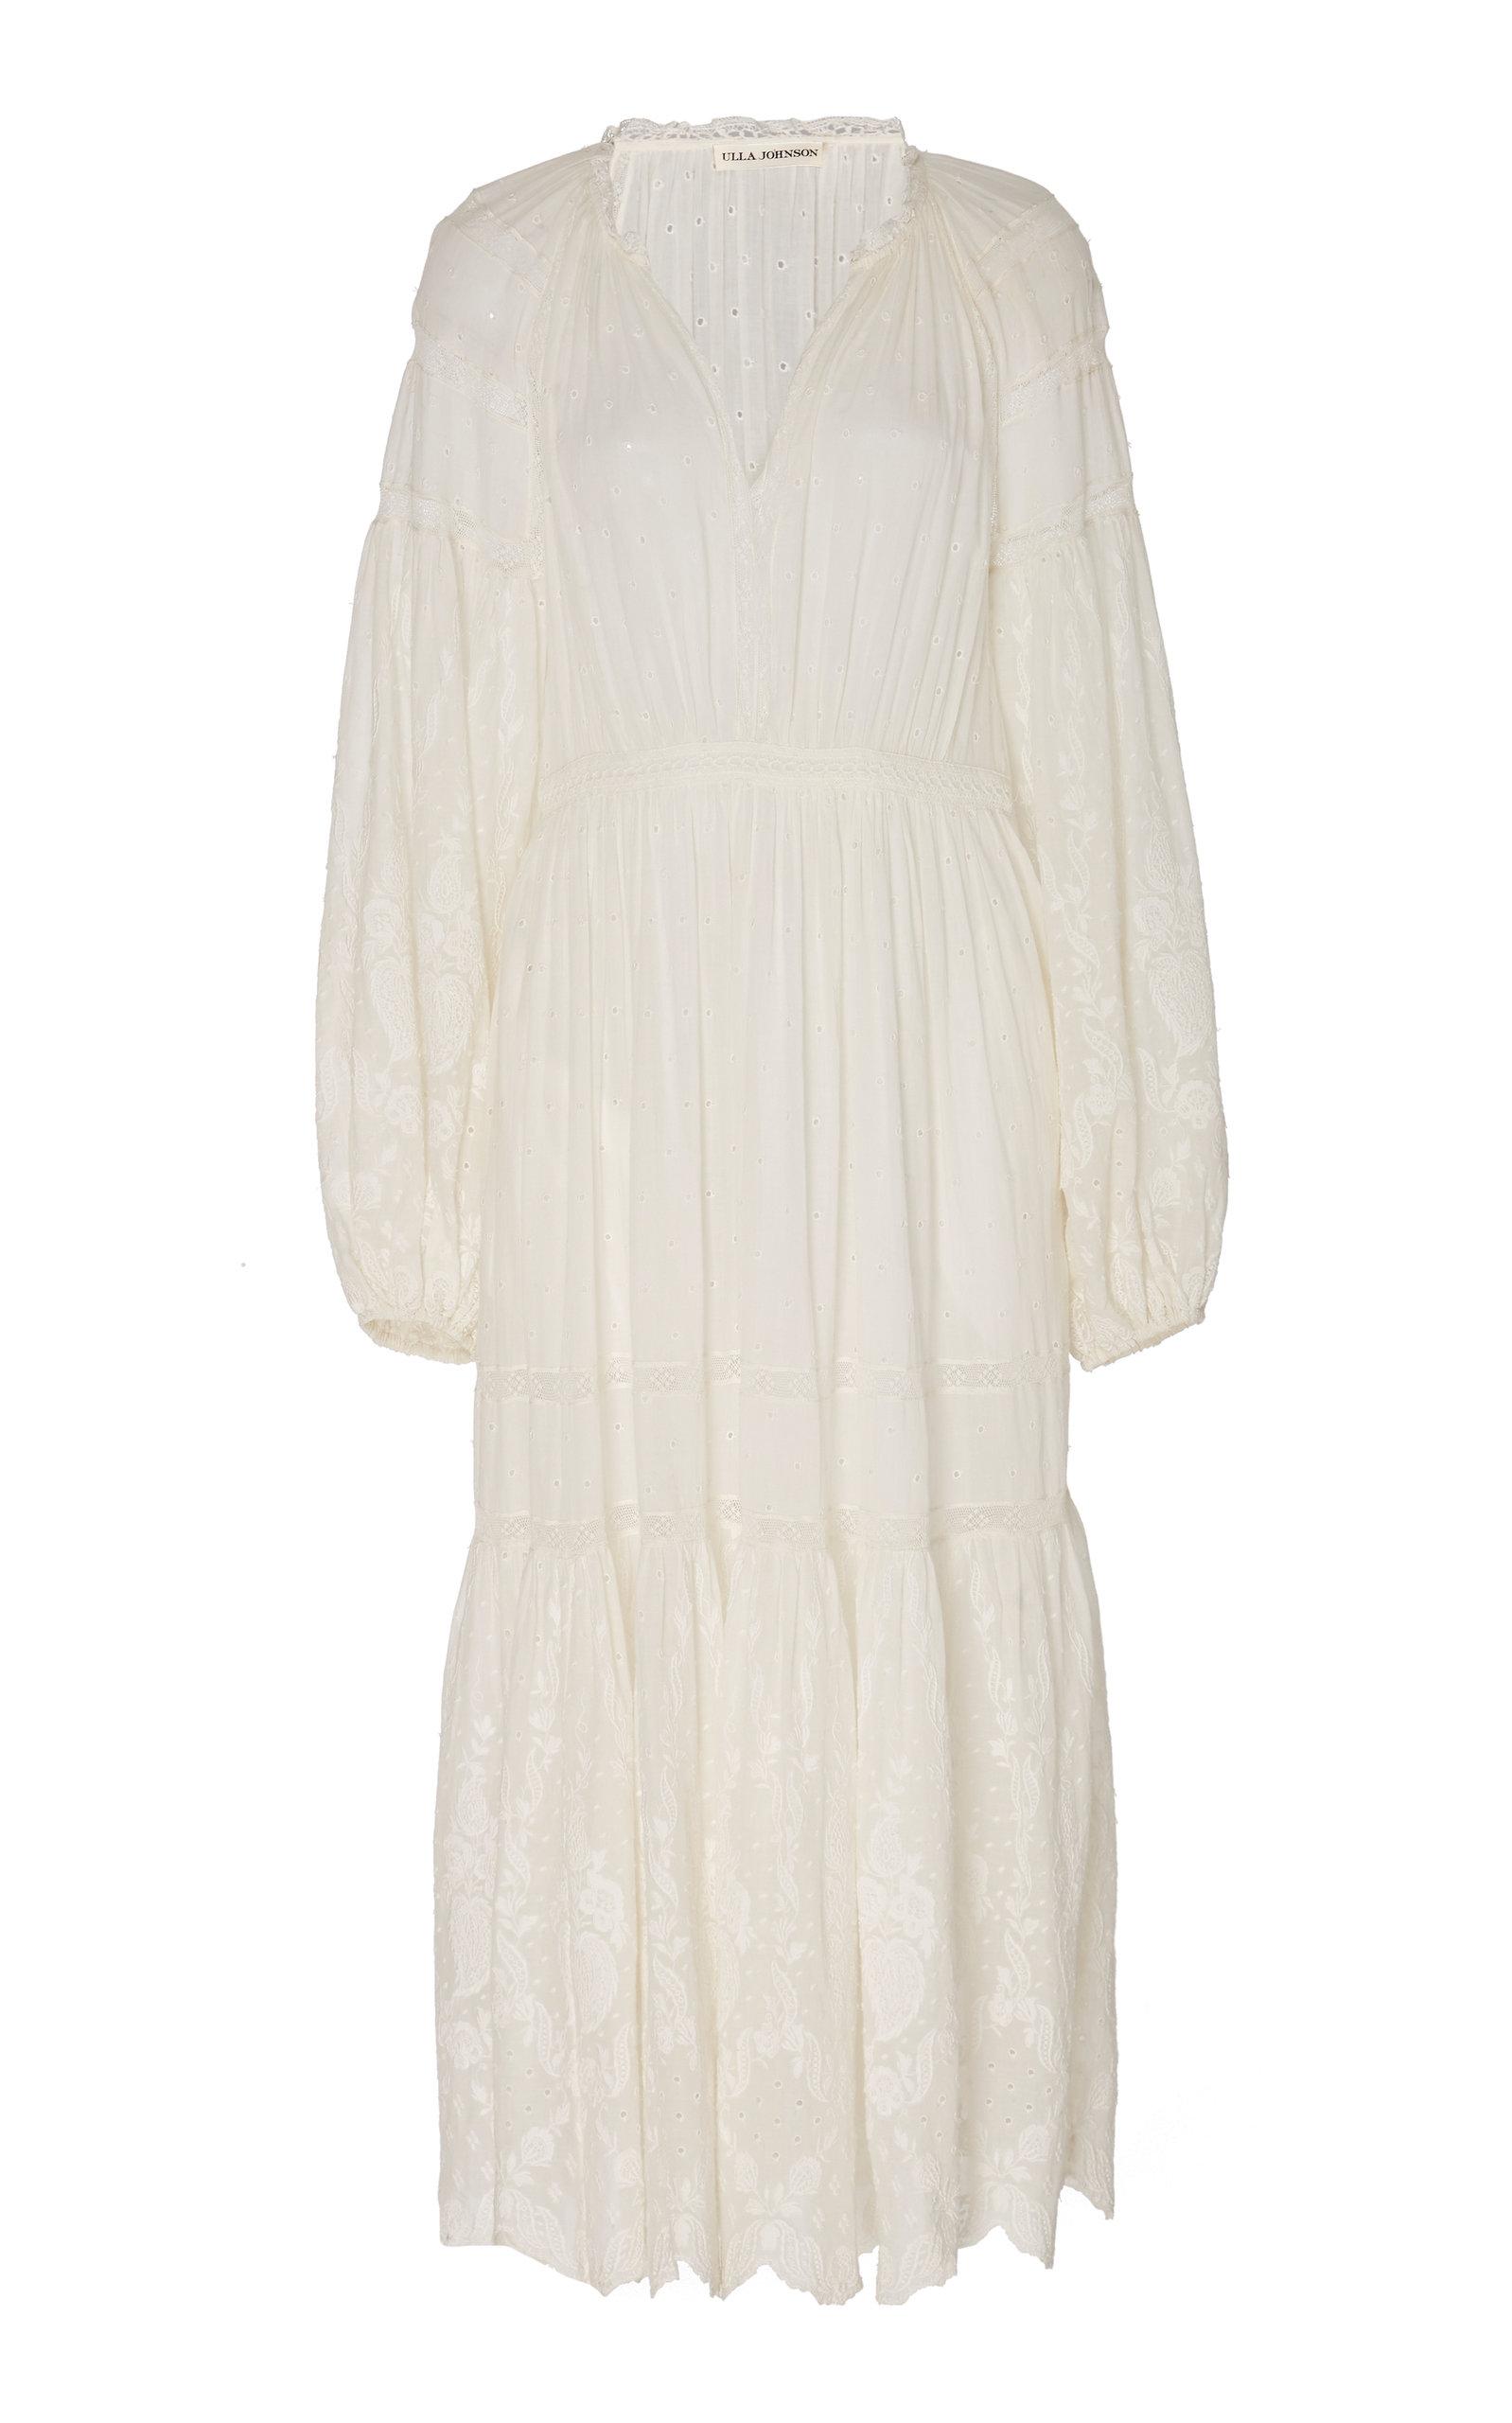 Buy Ulla Johnson Bettina Cotton Eyelet Dress online, shop Ulla Johnson at the best price